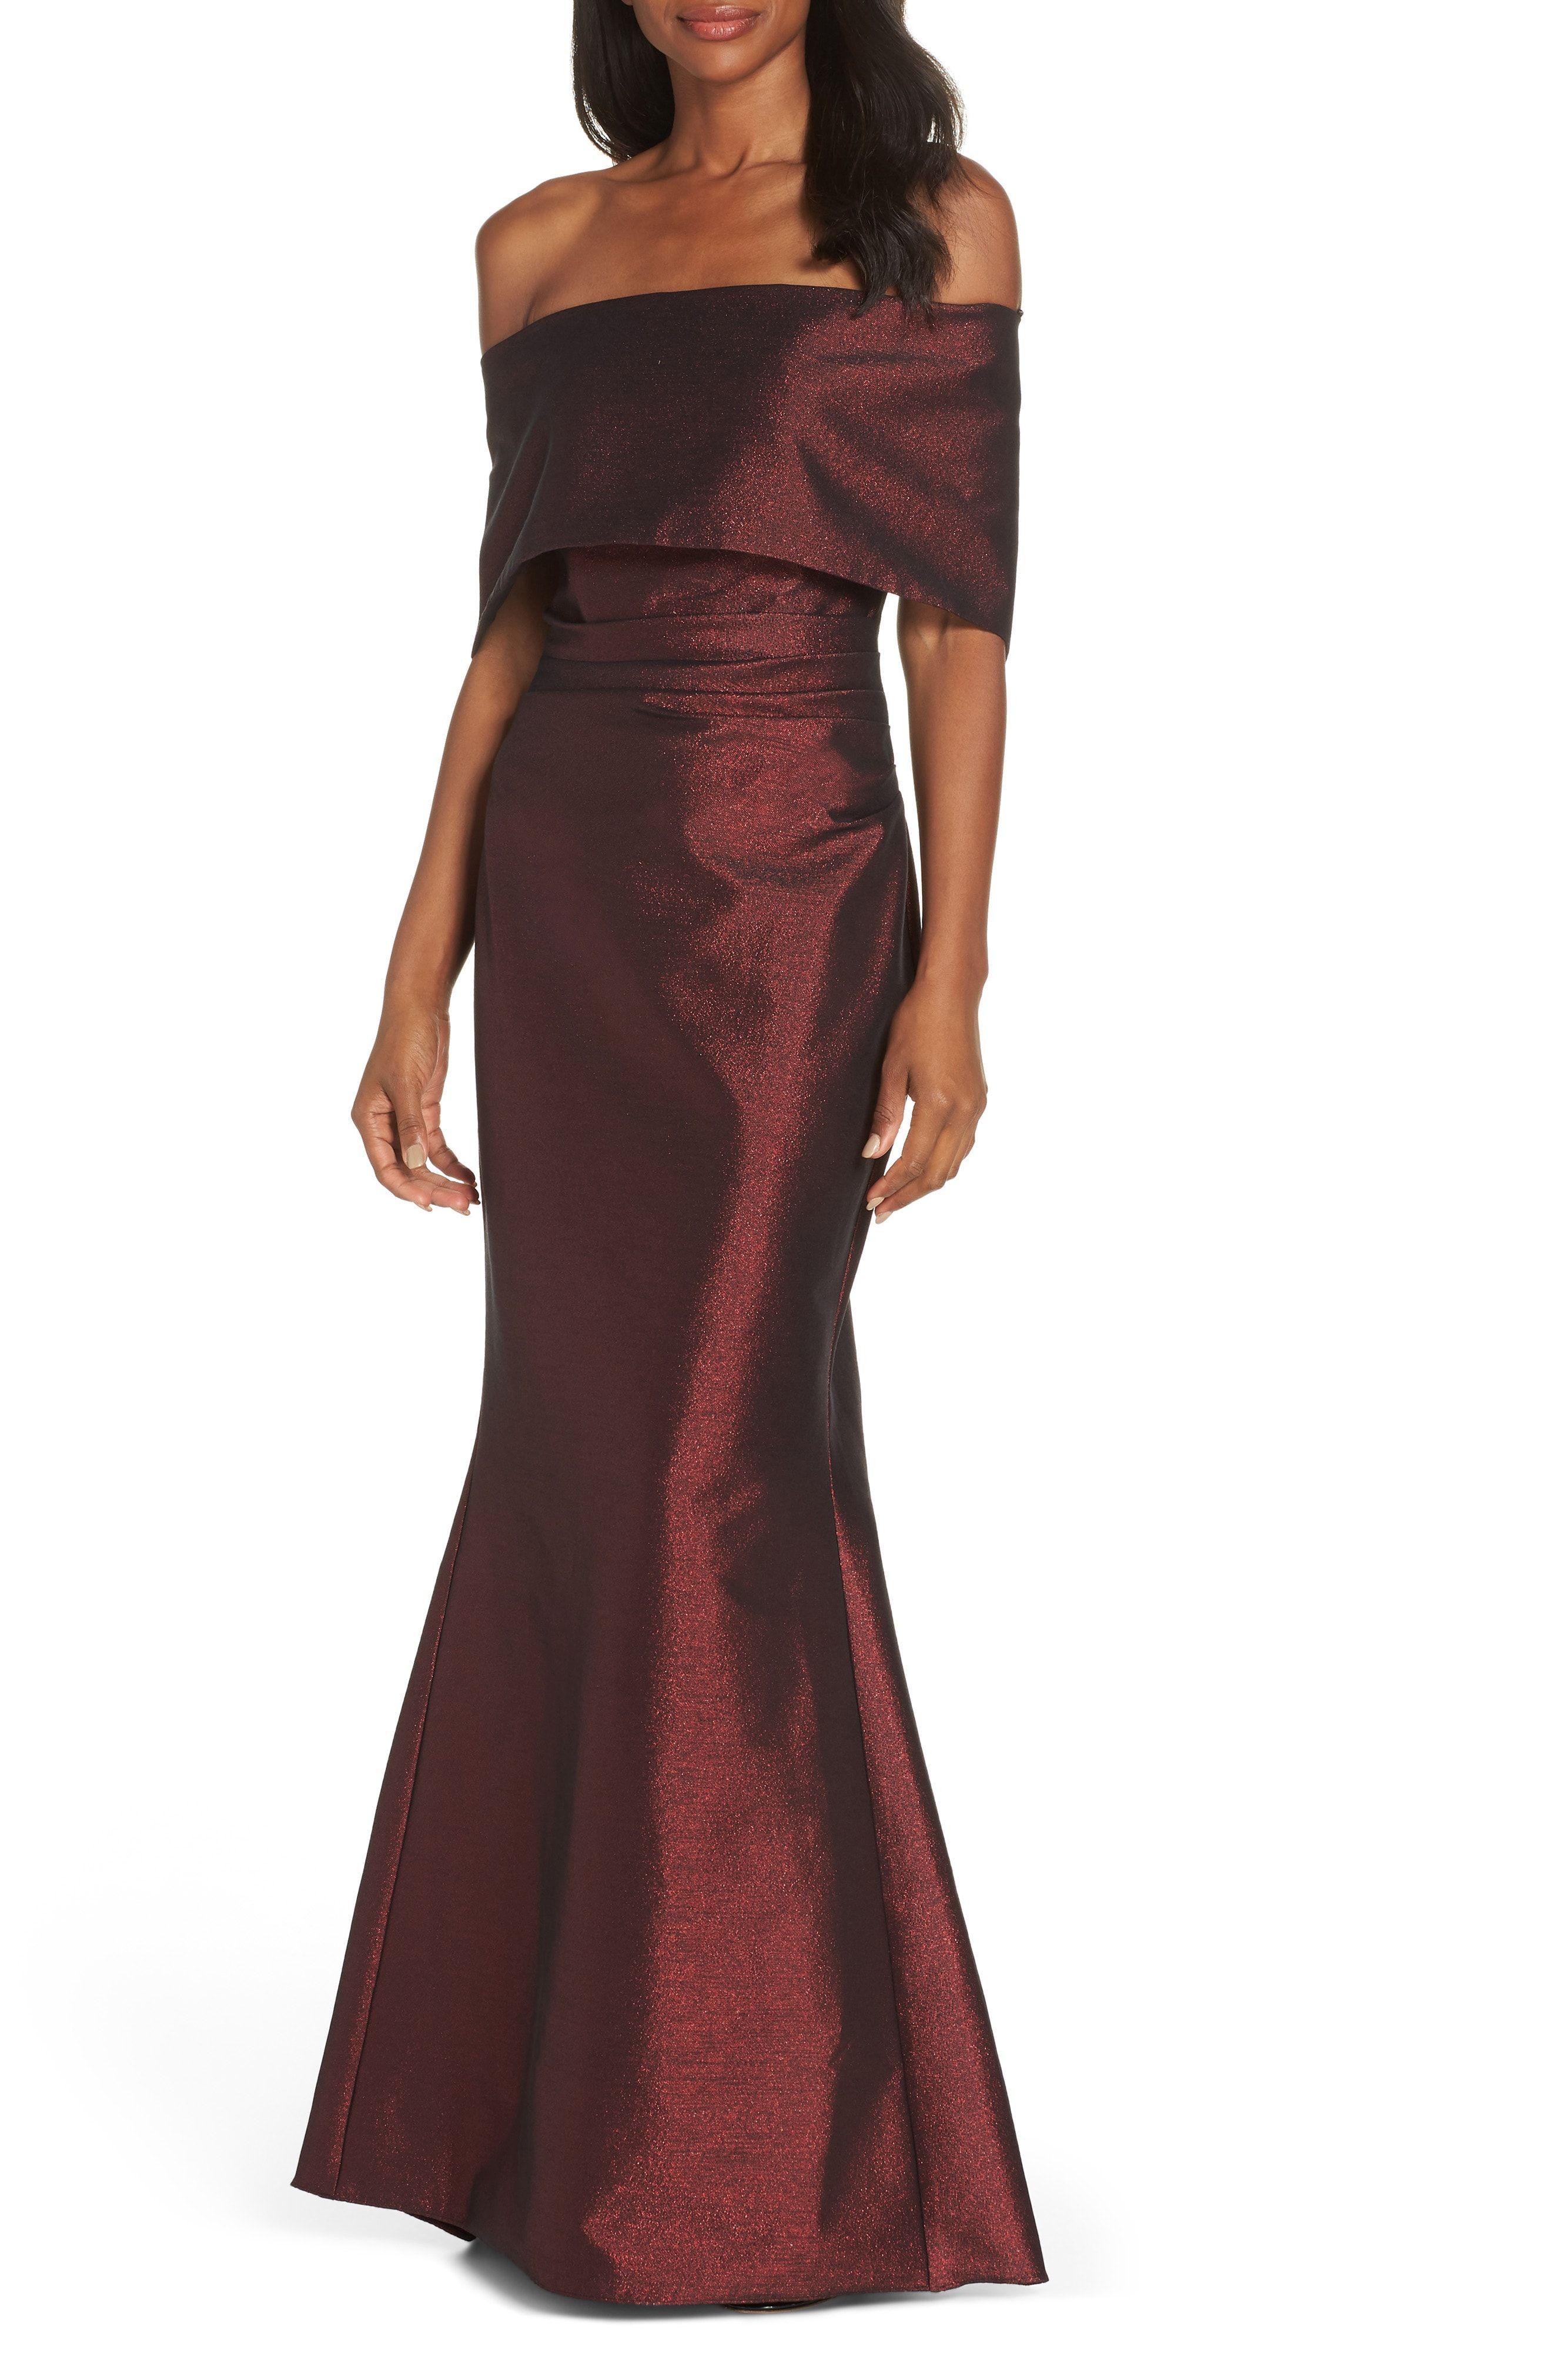 Burgundy Red Off The Shoulder Formal Gown Vince Camuto Foldover Neckline Gown Affiliate Stylish Formal Dresses Short Mermaid Dress Strapless Dress Formal [ 4048 x 2640 Pixel ]